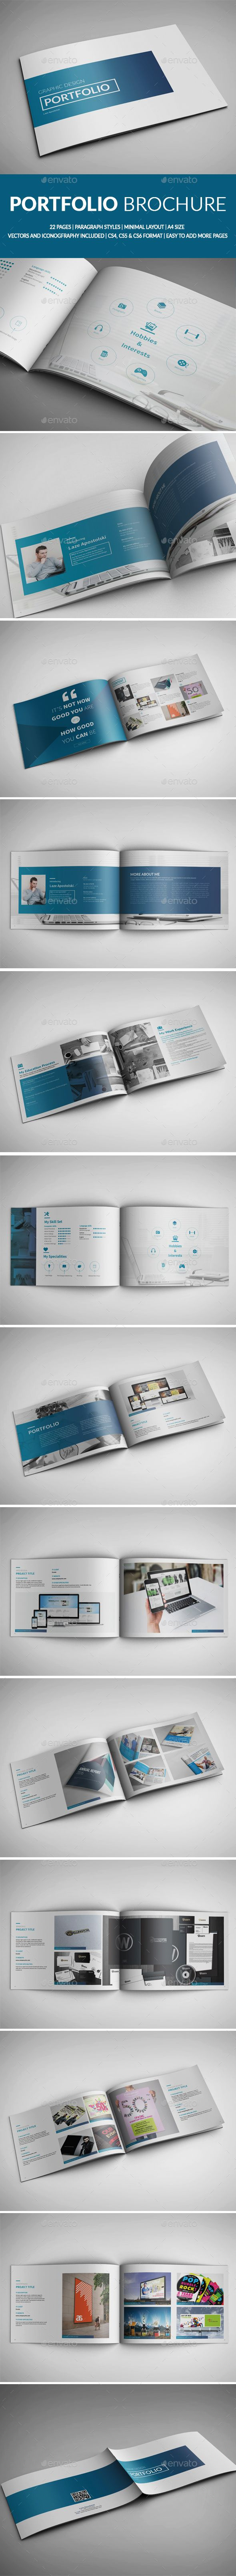 Portfolio Brochure Template InDesign INDD #design Download: http://graphicriver.net/item/portfolio-template/13485486?ref=ksioks